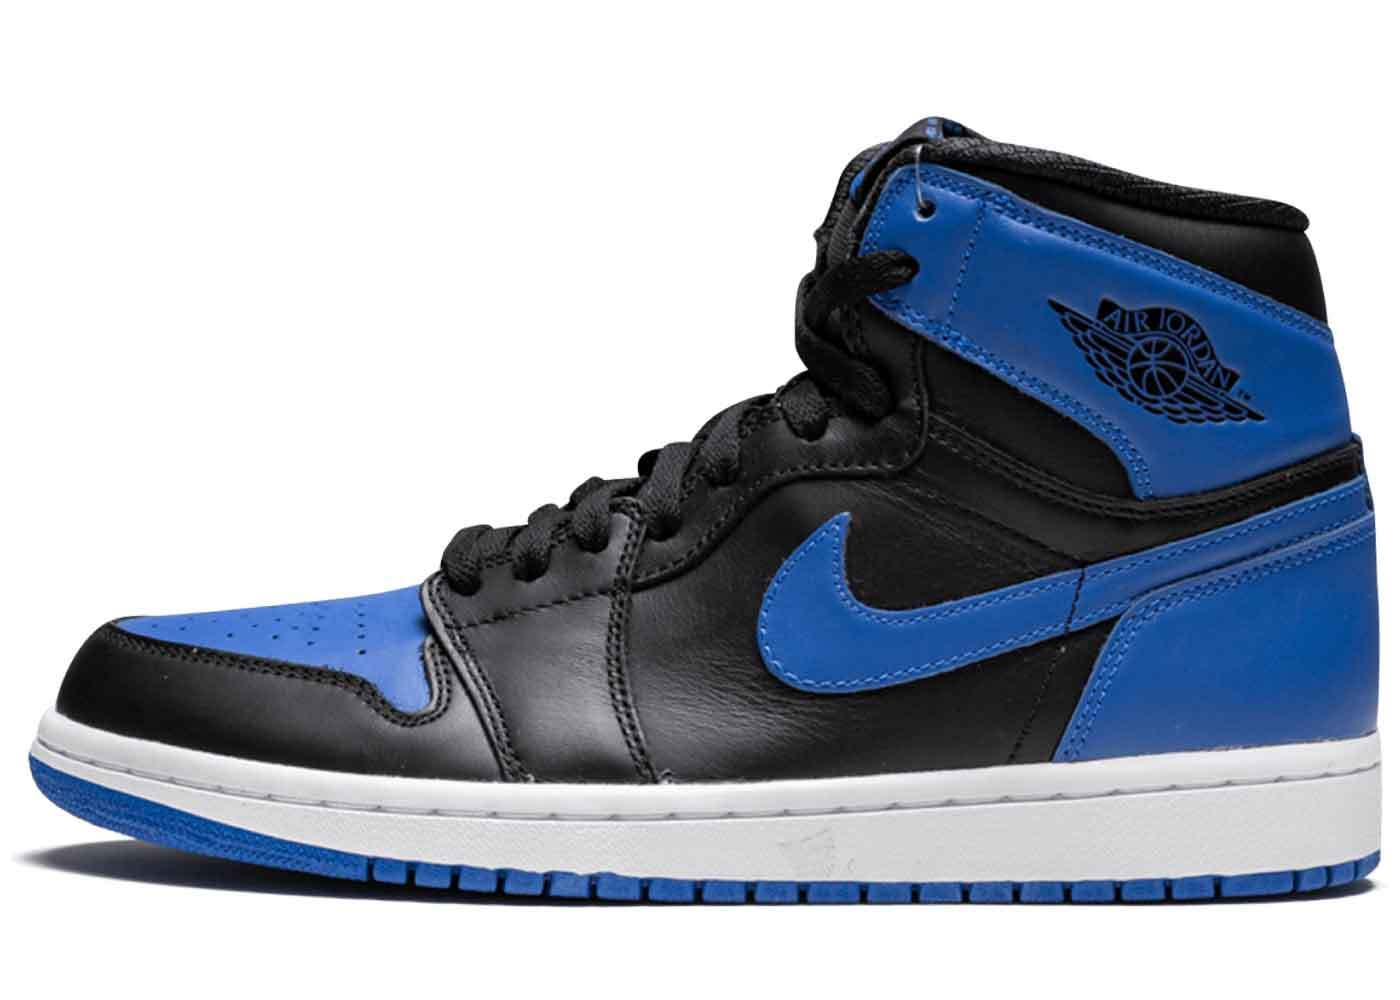 Nike Air Jordan 1 Retro Black Royal Blue (2013)の写真